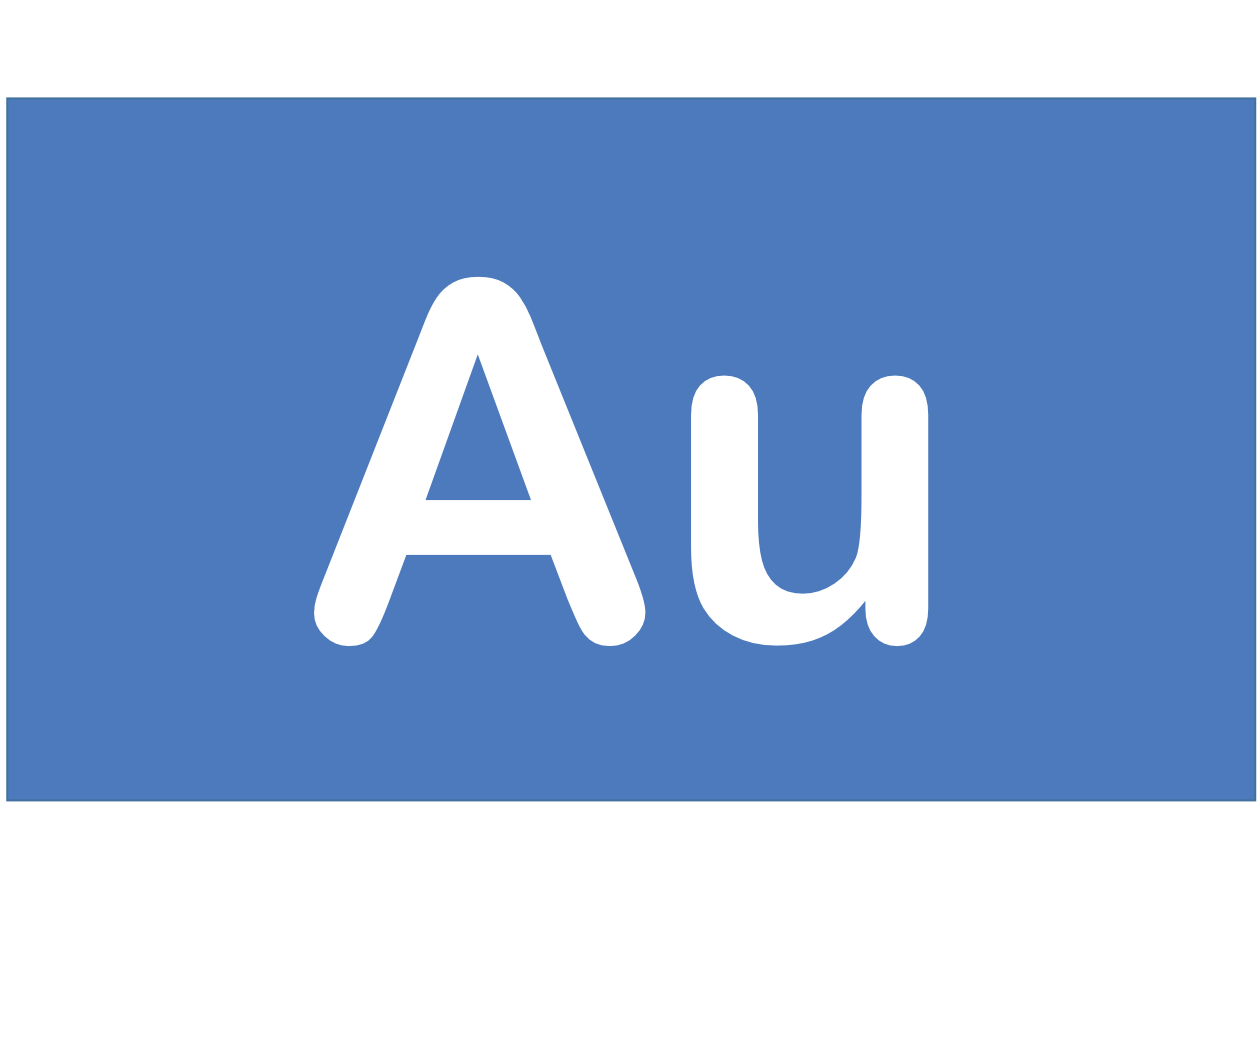 79 Au 金 Gold 元素 記号 周期表 化学 原子